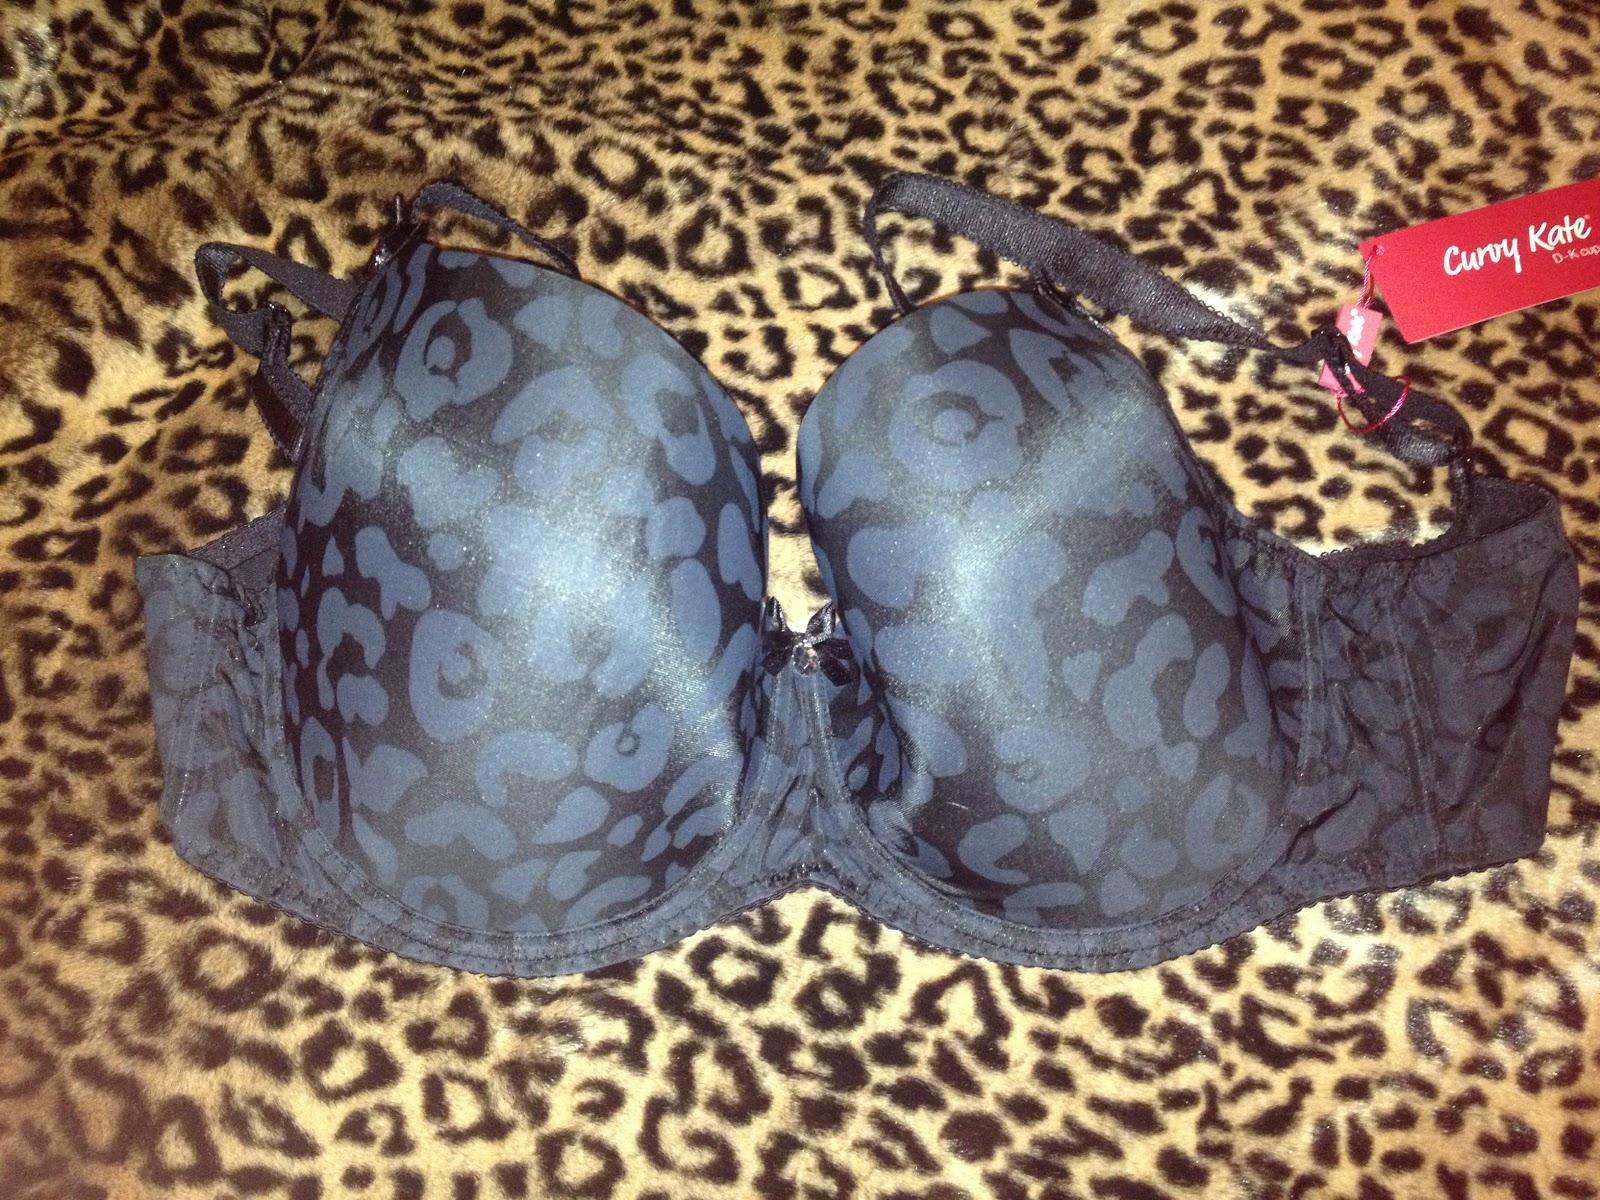 FASHION | Curvy Kate Smoothie Bra Review